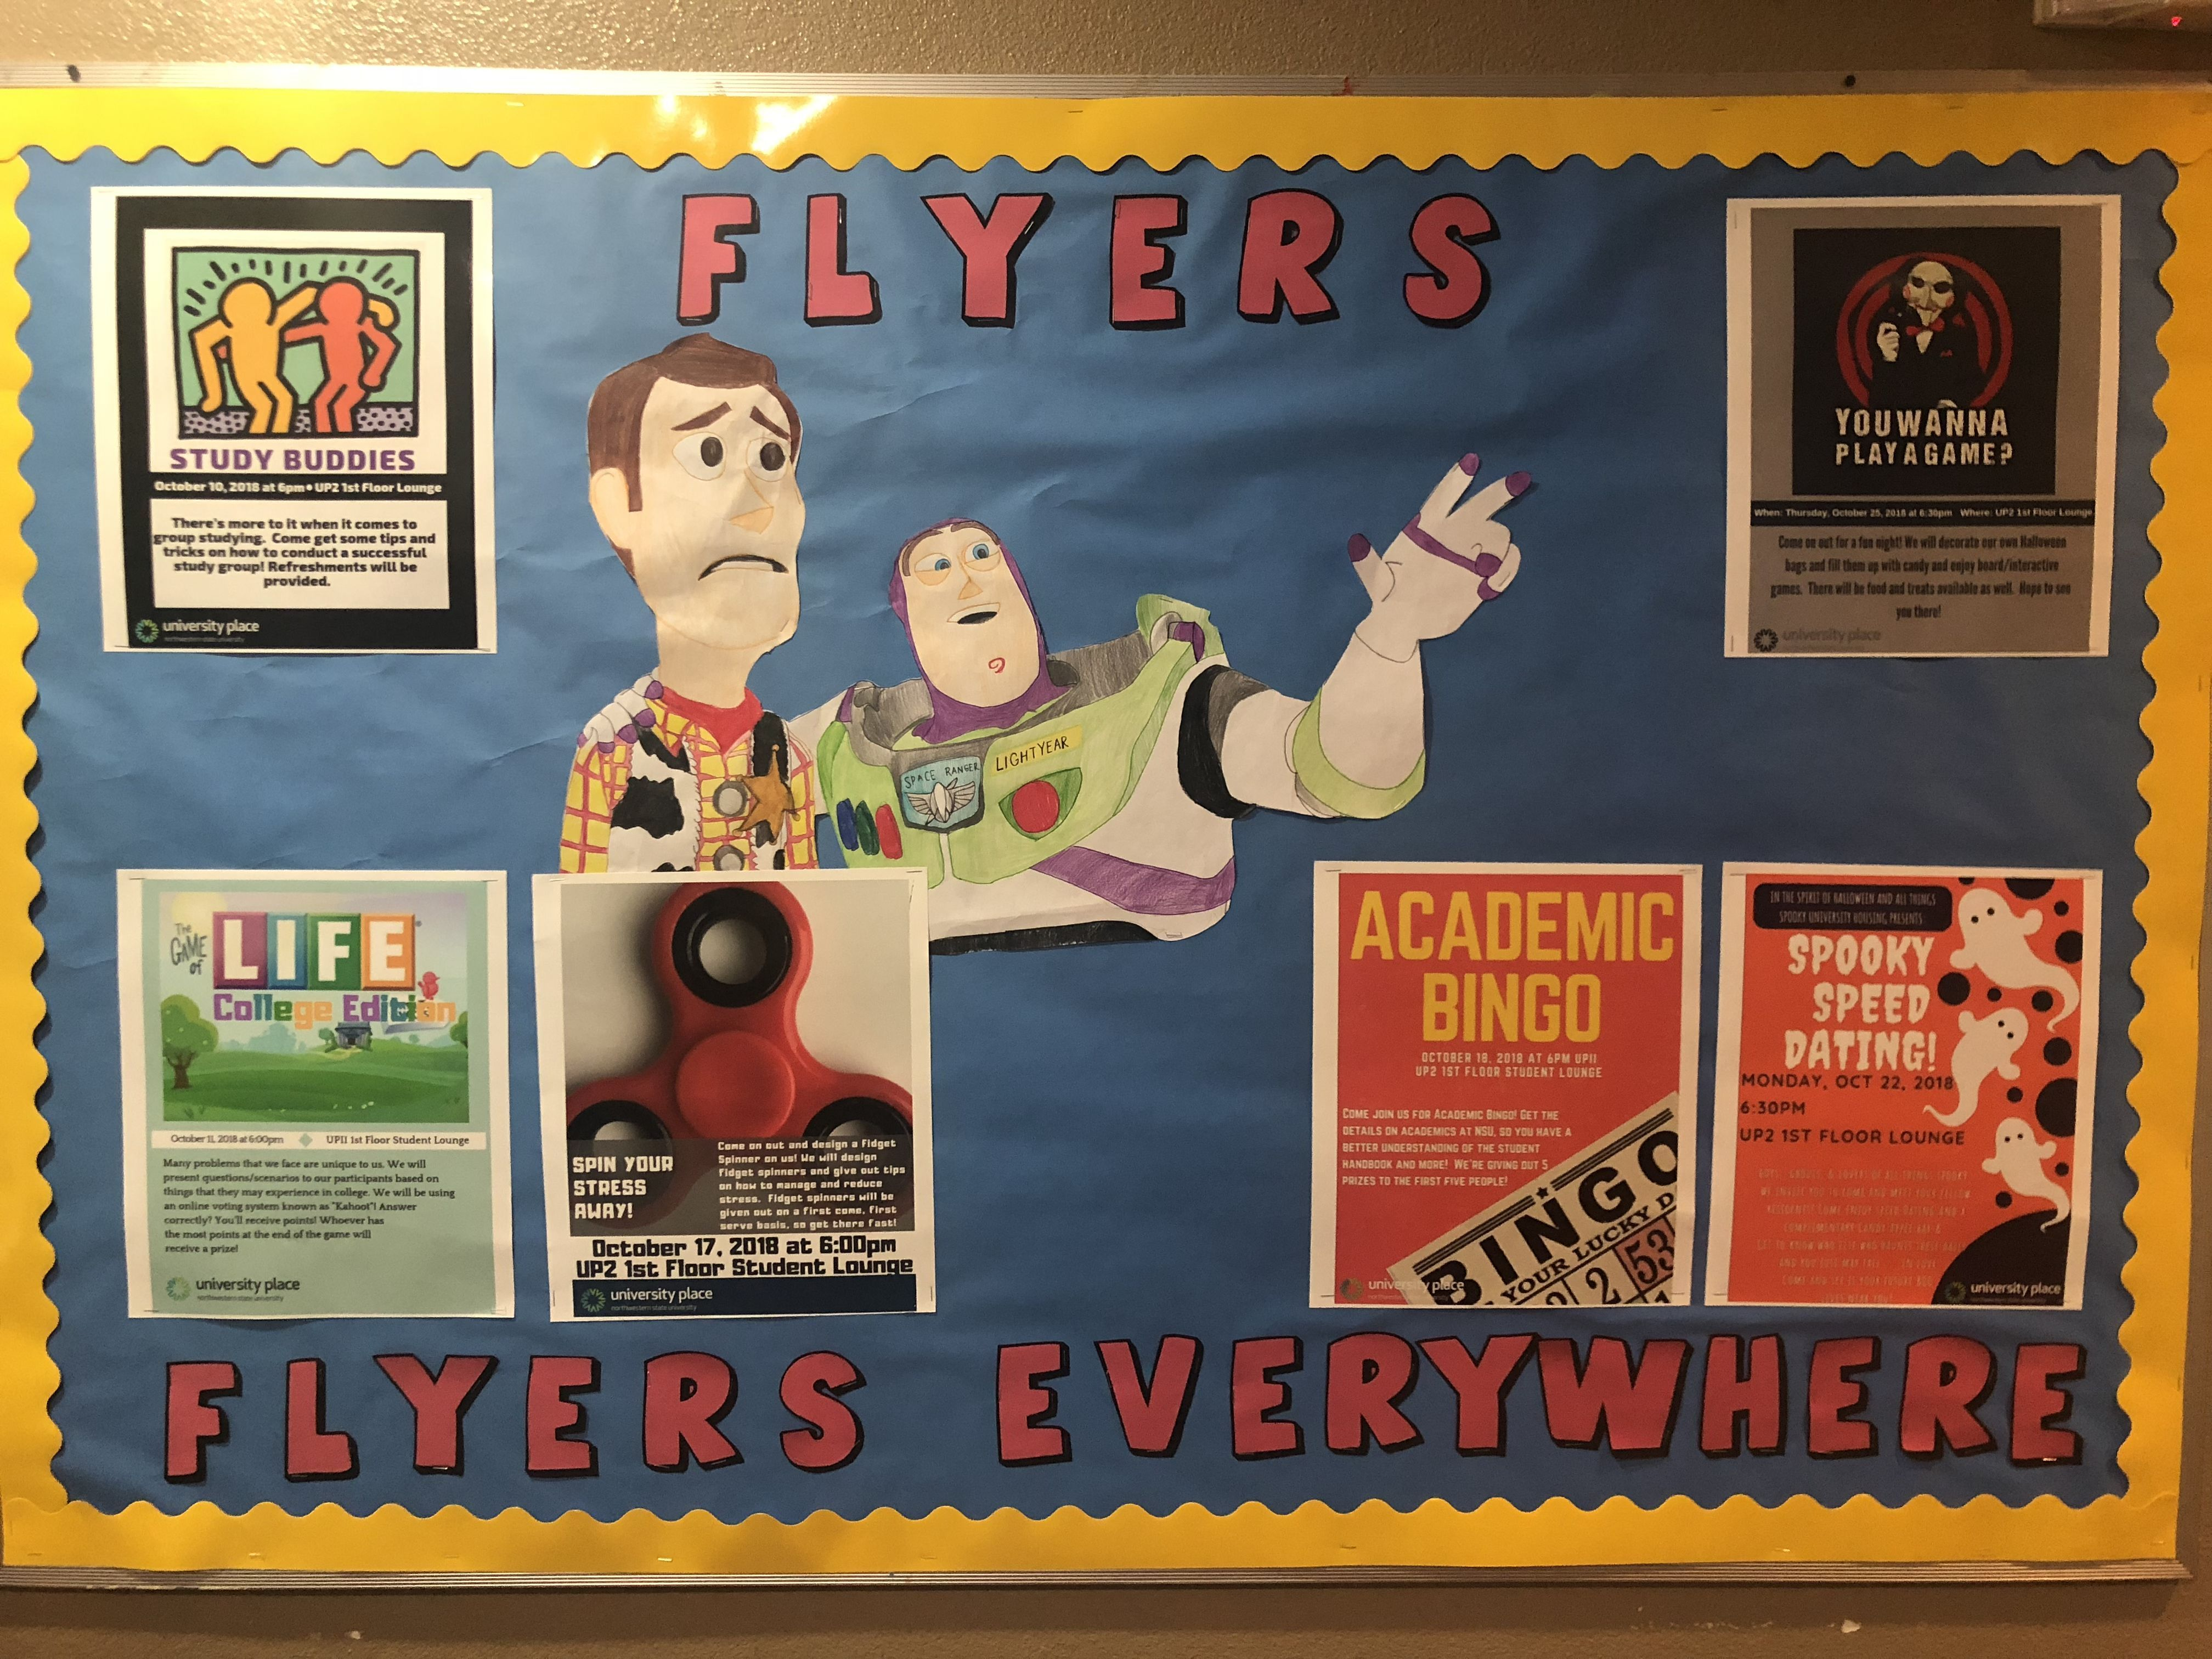 Toy Story RA Bulletin Board #rabulletinboards Toy Story RA Bulletin Board #rabulletinboards Toy Story RA Bulletin Board #rabulletinboards Toy Story RA Bulletin Board #rabulletinboards